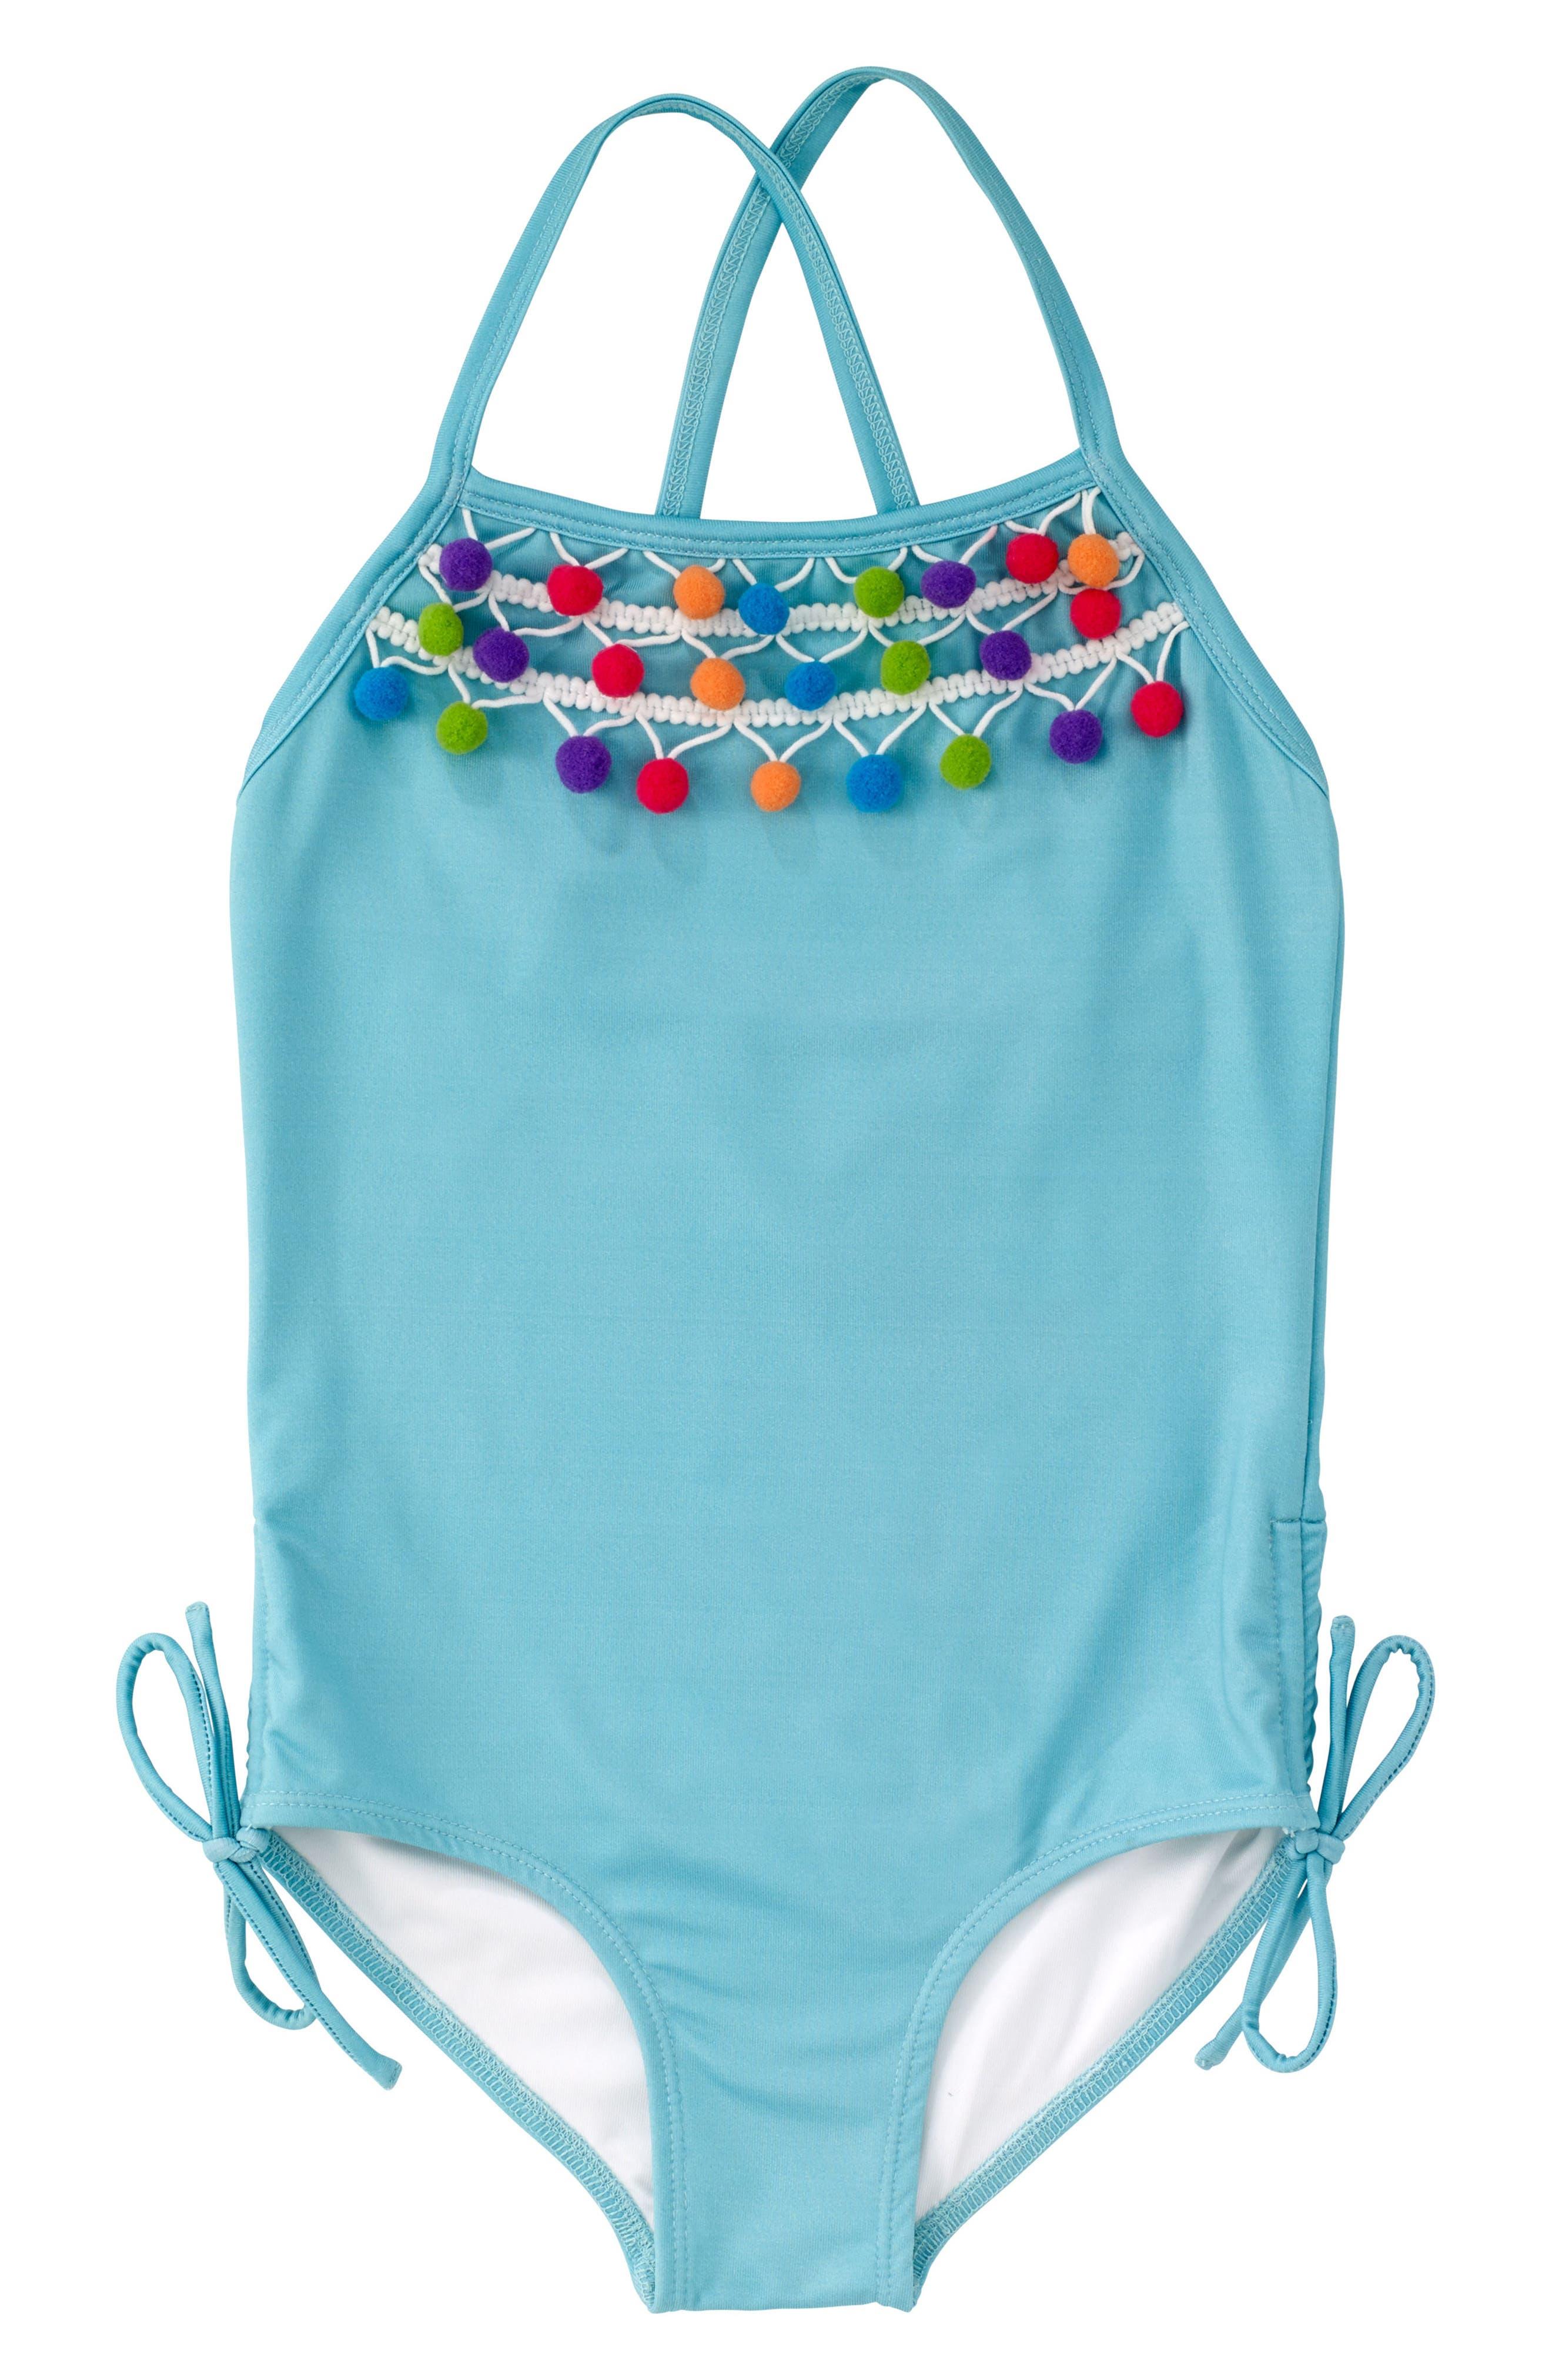 Pompom One-Piece Swimsuit,                             Main thumbnail 1, color,                             400